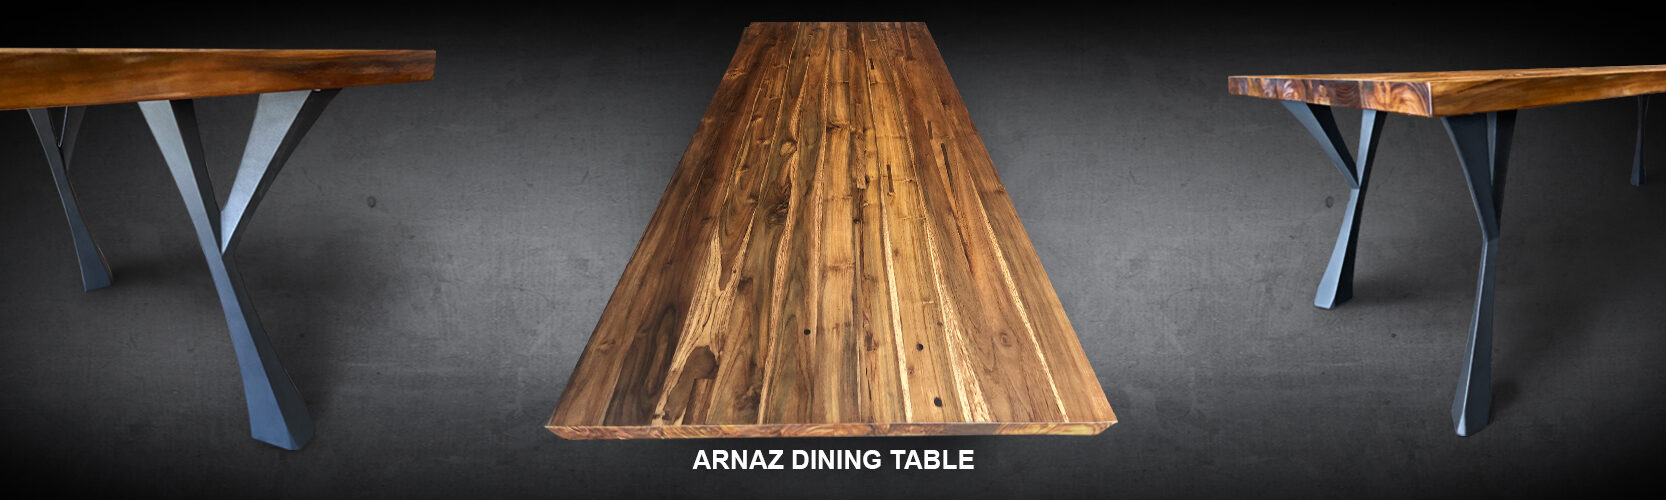 Arnaz Dining Table Reclaimed Teak Wood Iron Base